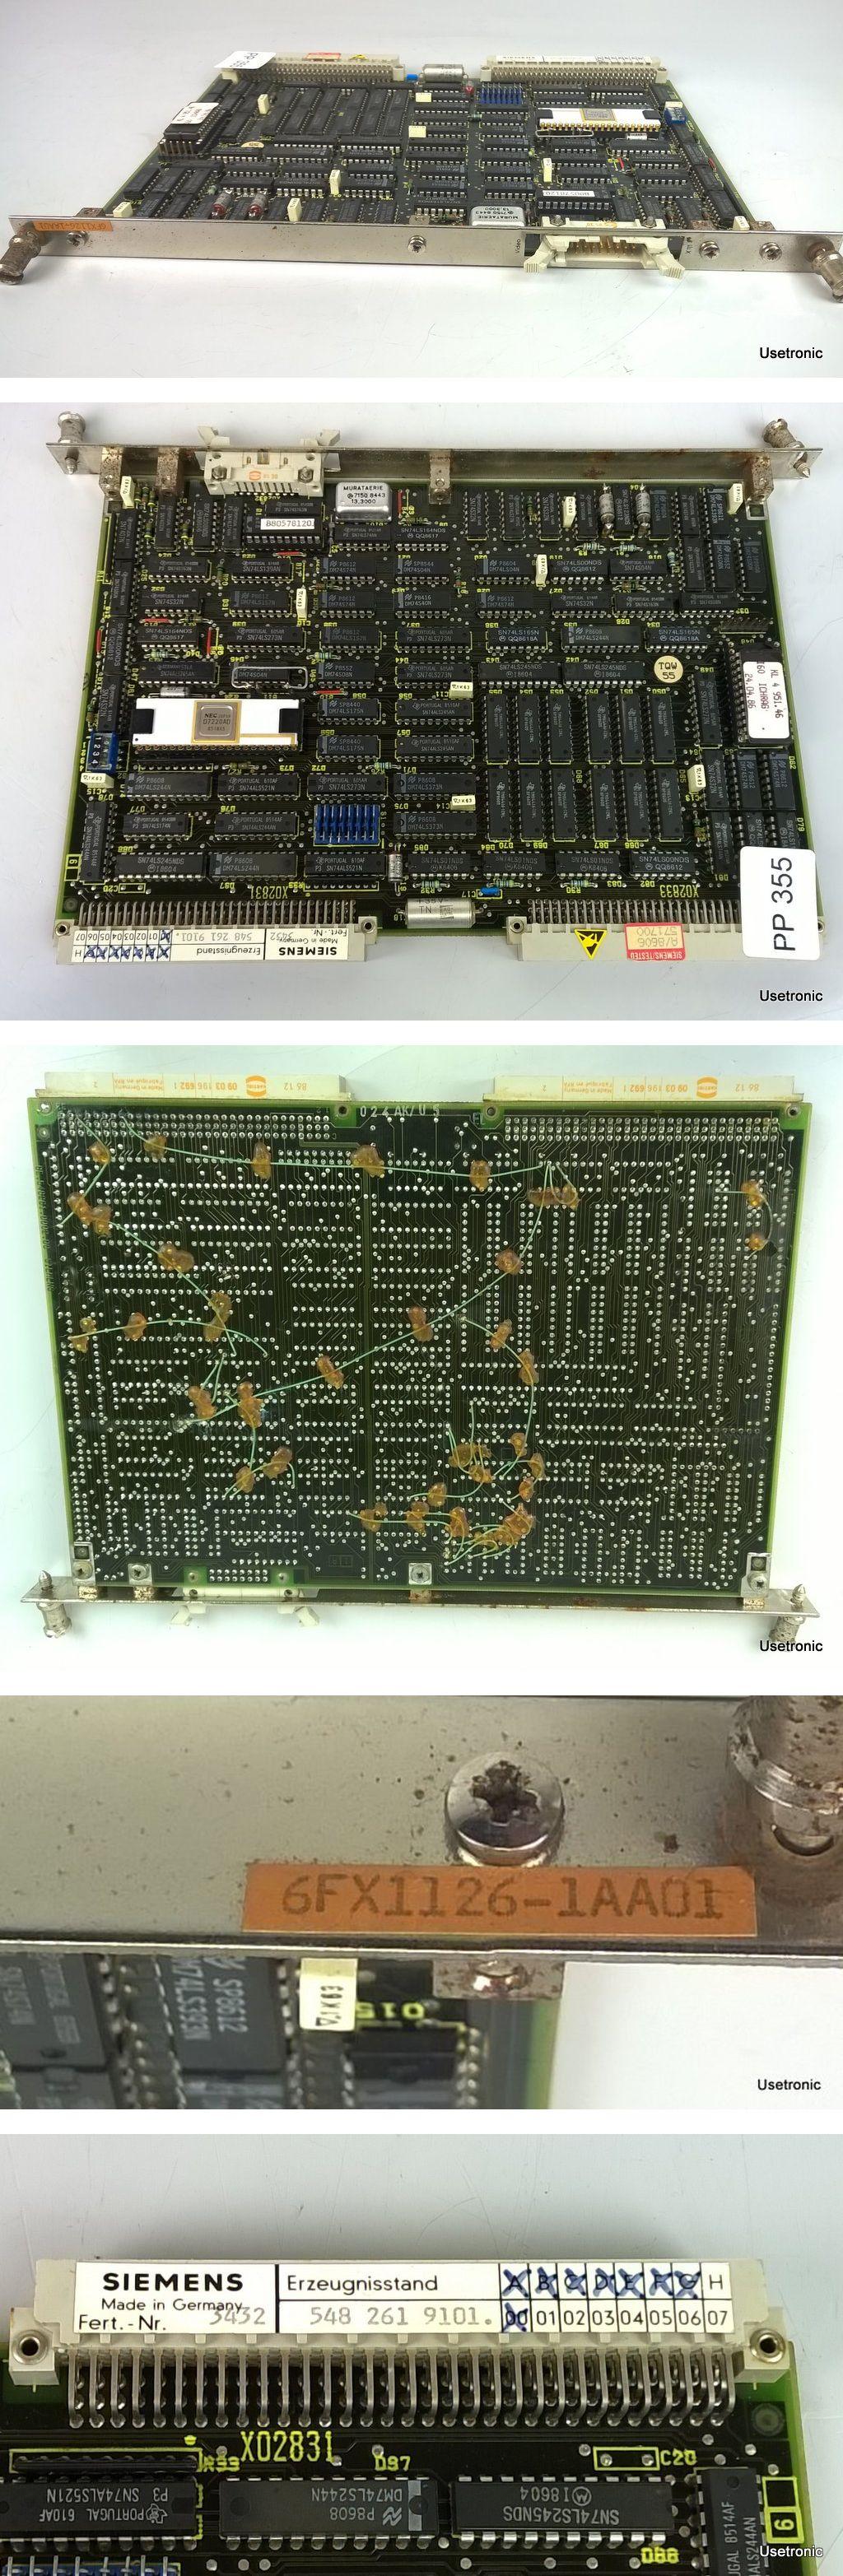 Siemens 6FX1126-1AA01